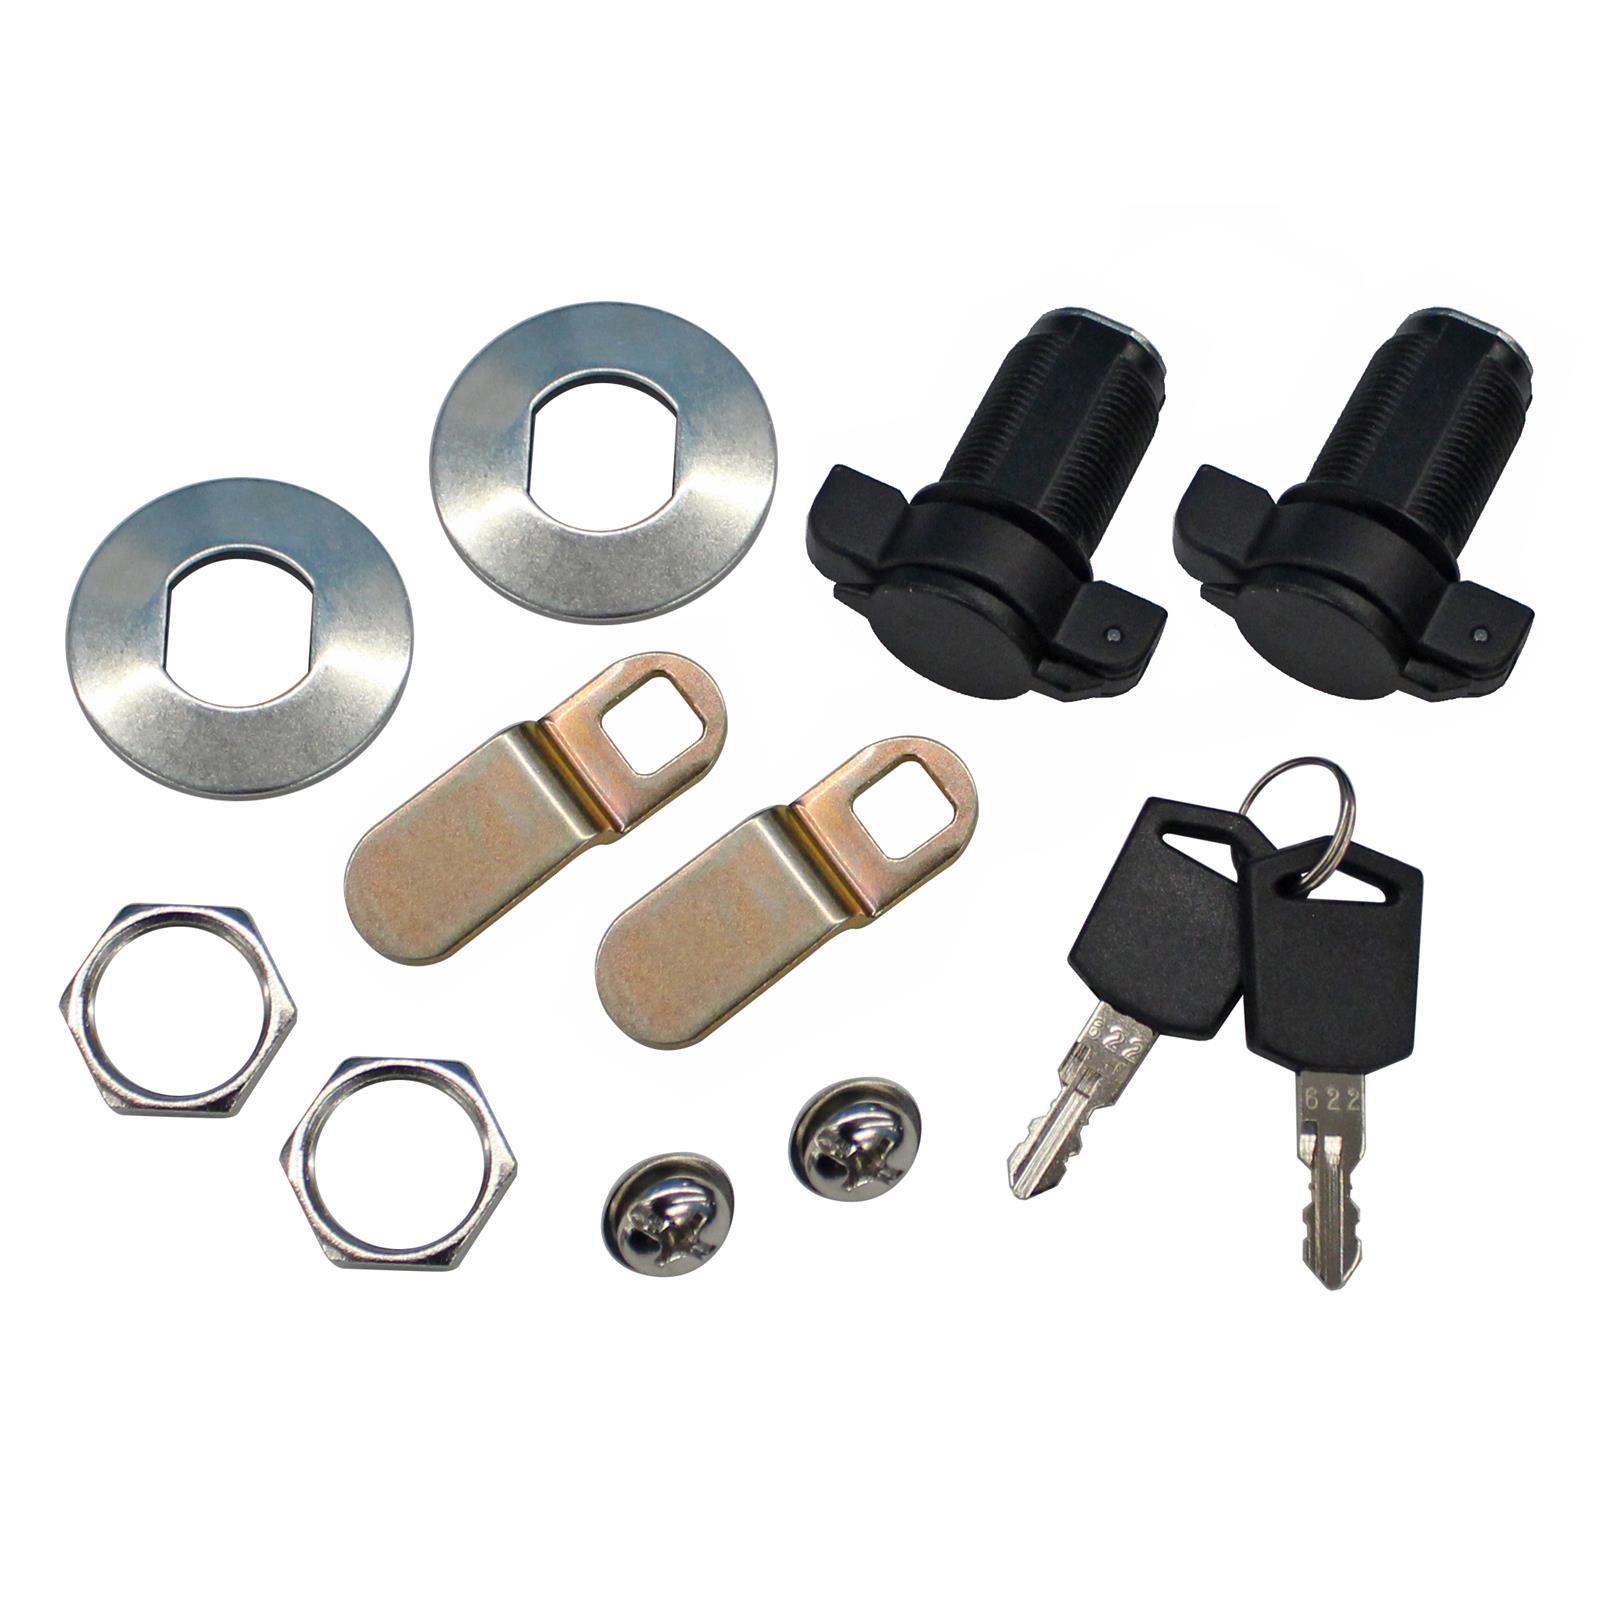 Undercover Rsas1001cl Tonneau Cover Replacement Lock And Key Set 6xx J2xx Key Ebay